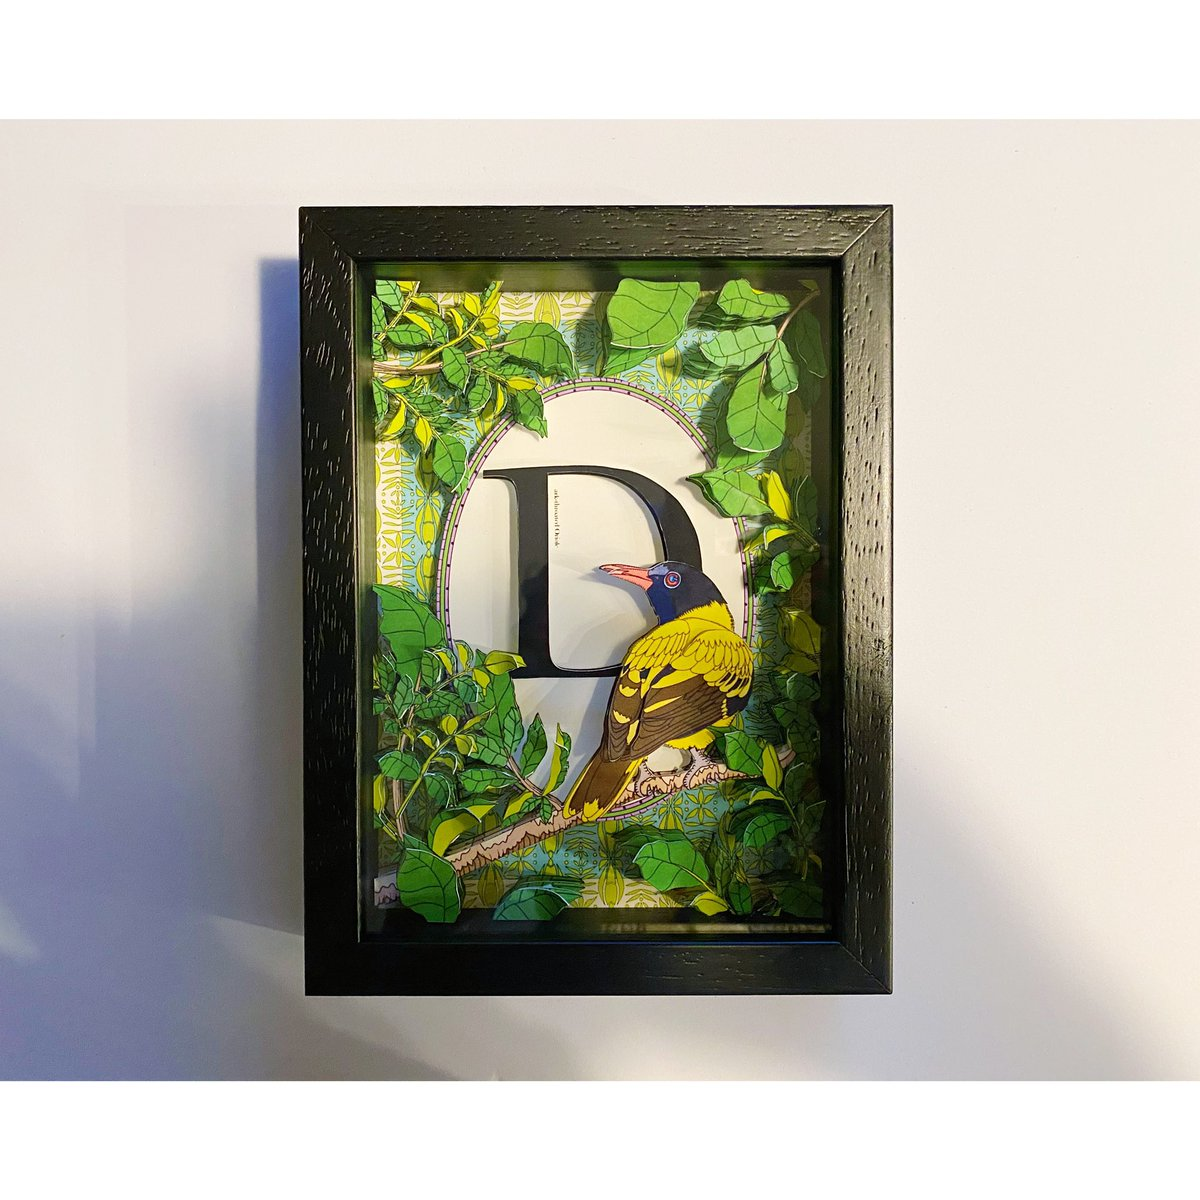 "Today's new art ""Dark throated oriole "" アルファベットシリーズ vol.21 切り絵仕上がりました☆ 4/1〜4/7まで阪神百貨店梅田本店4FにてPOP UP SHOP出店、アルファベットシリーズ販売させて頂きます。是非お越し下さい☆ #serihano #artist  #植物柄 #イラスト #テキスタイル #アート #鳥pic.twitter.com/B1wd1dRjrn"